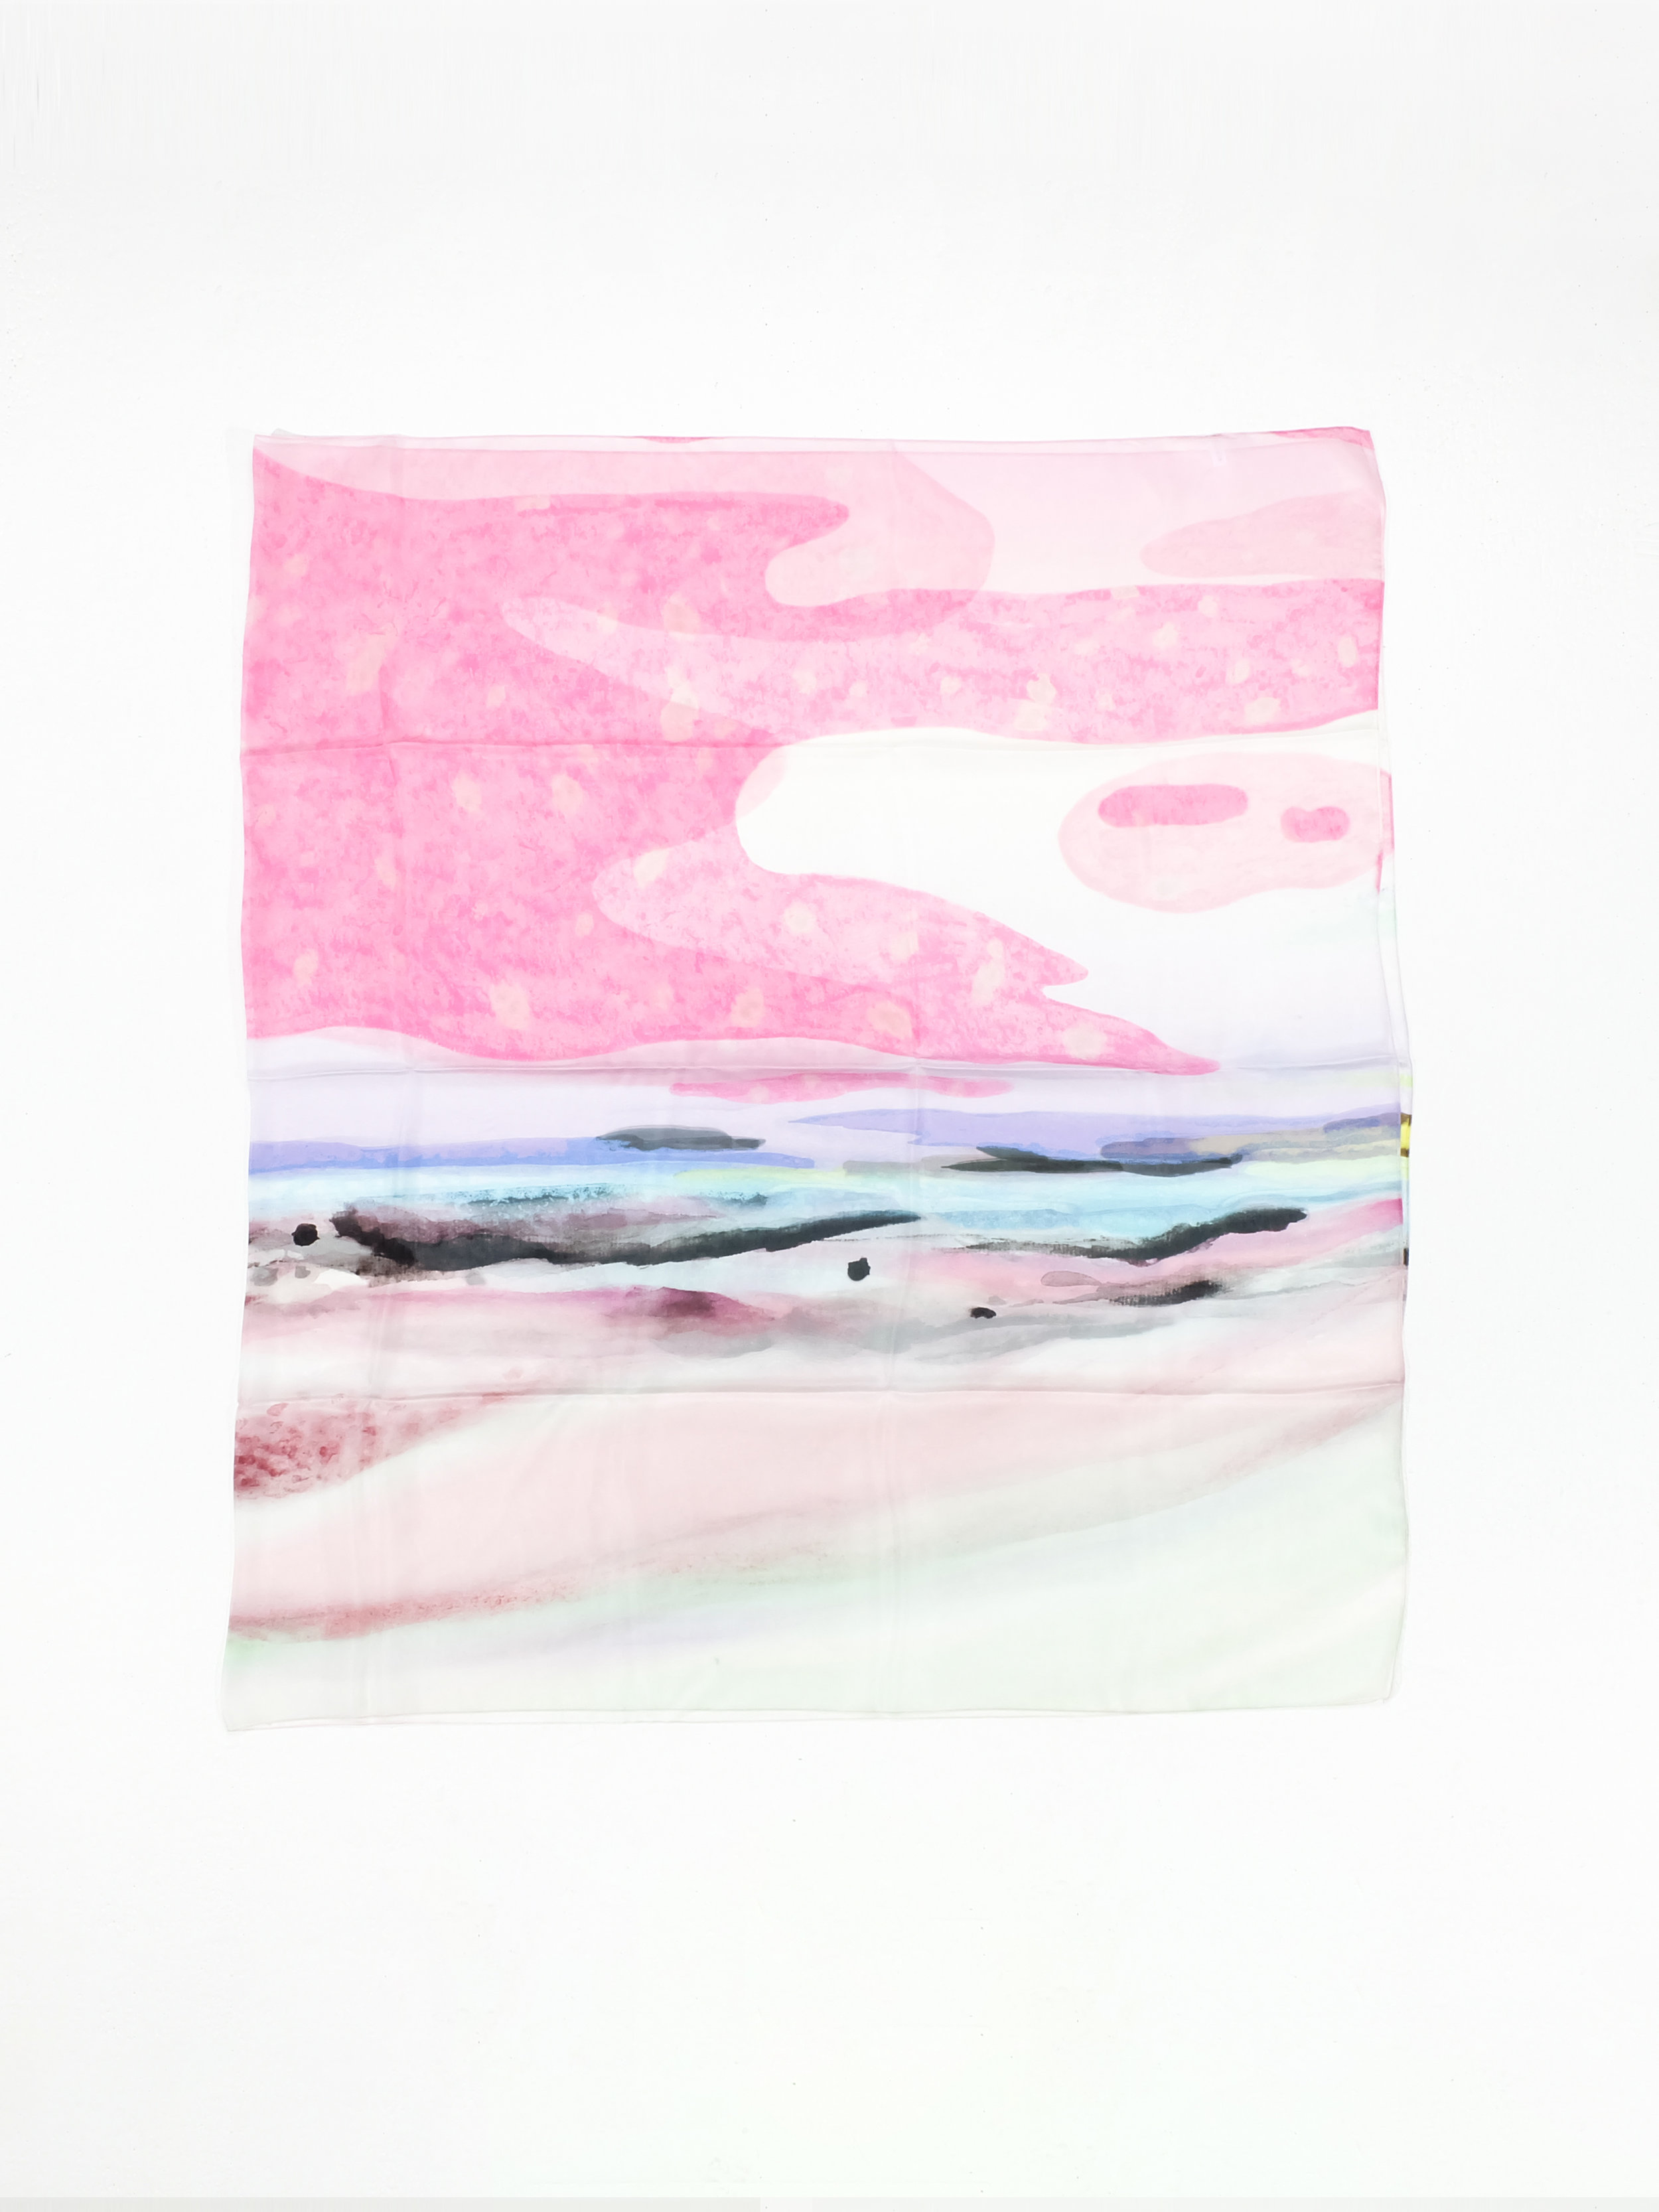 Waning of Winter (Pink) - 196x112cm